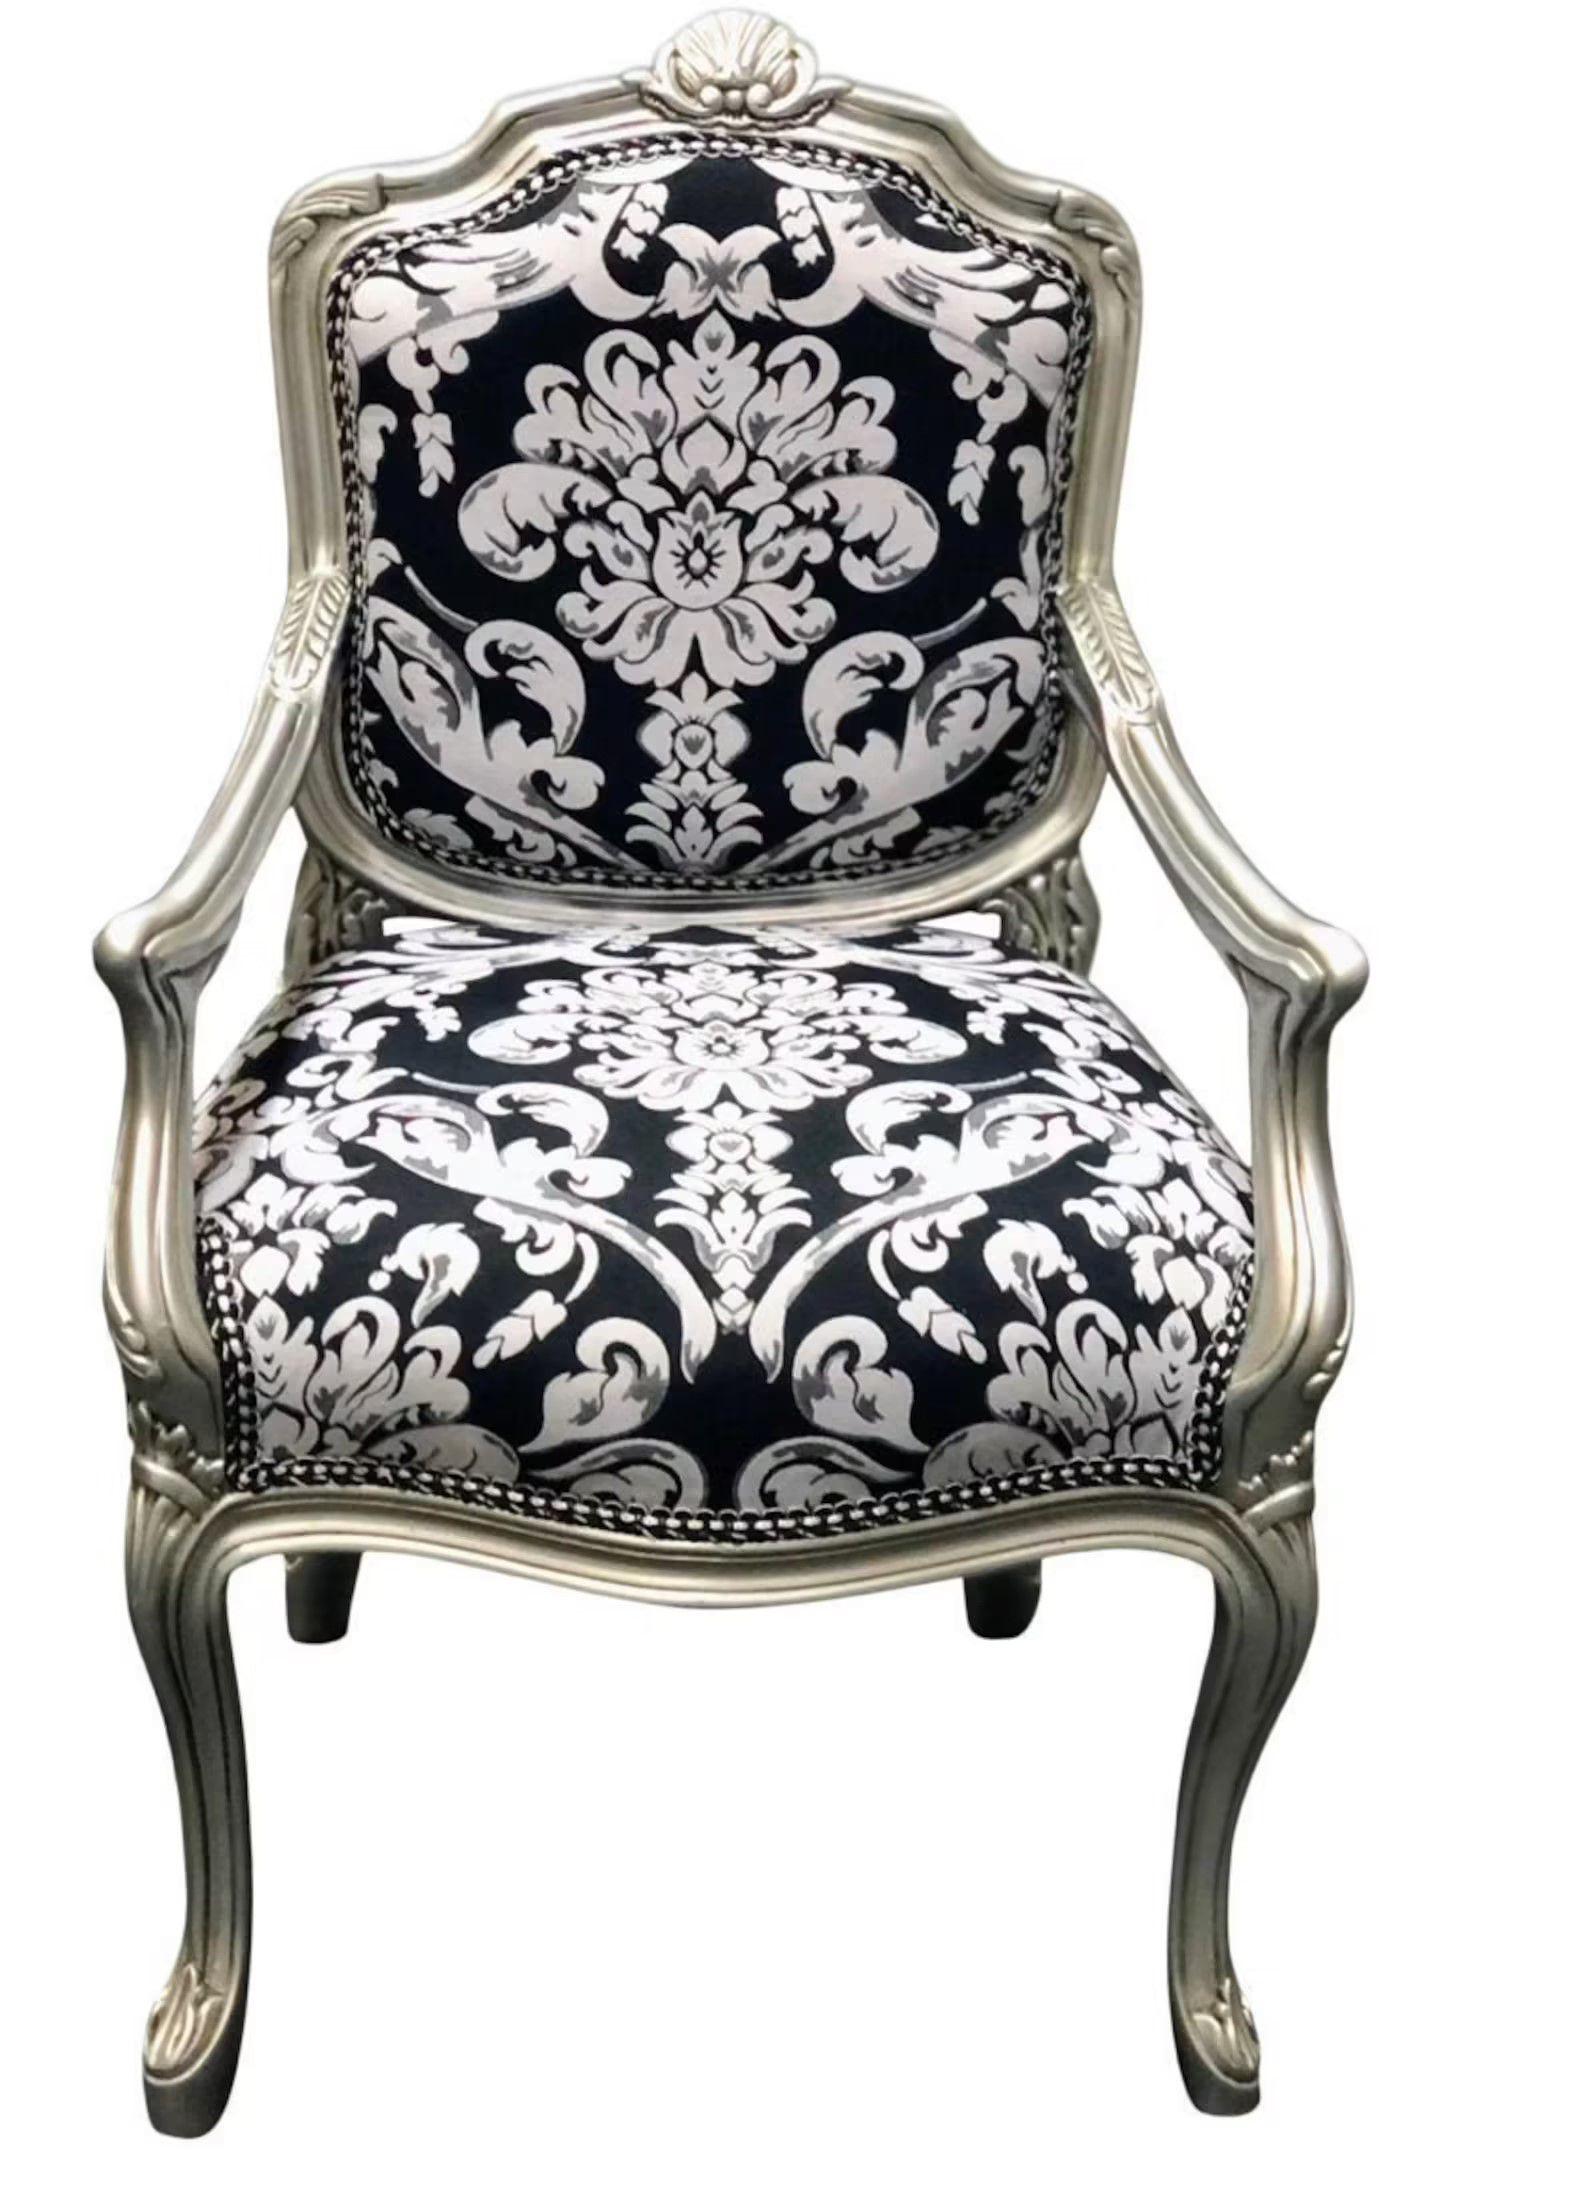 elegant black and white chair with metallic frame